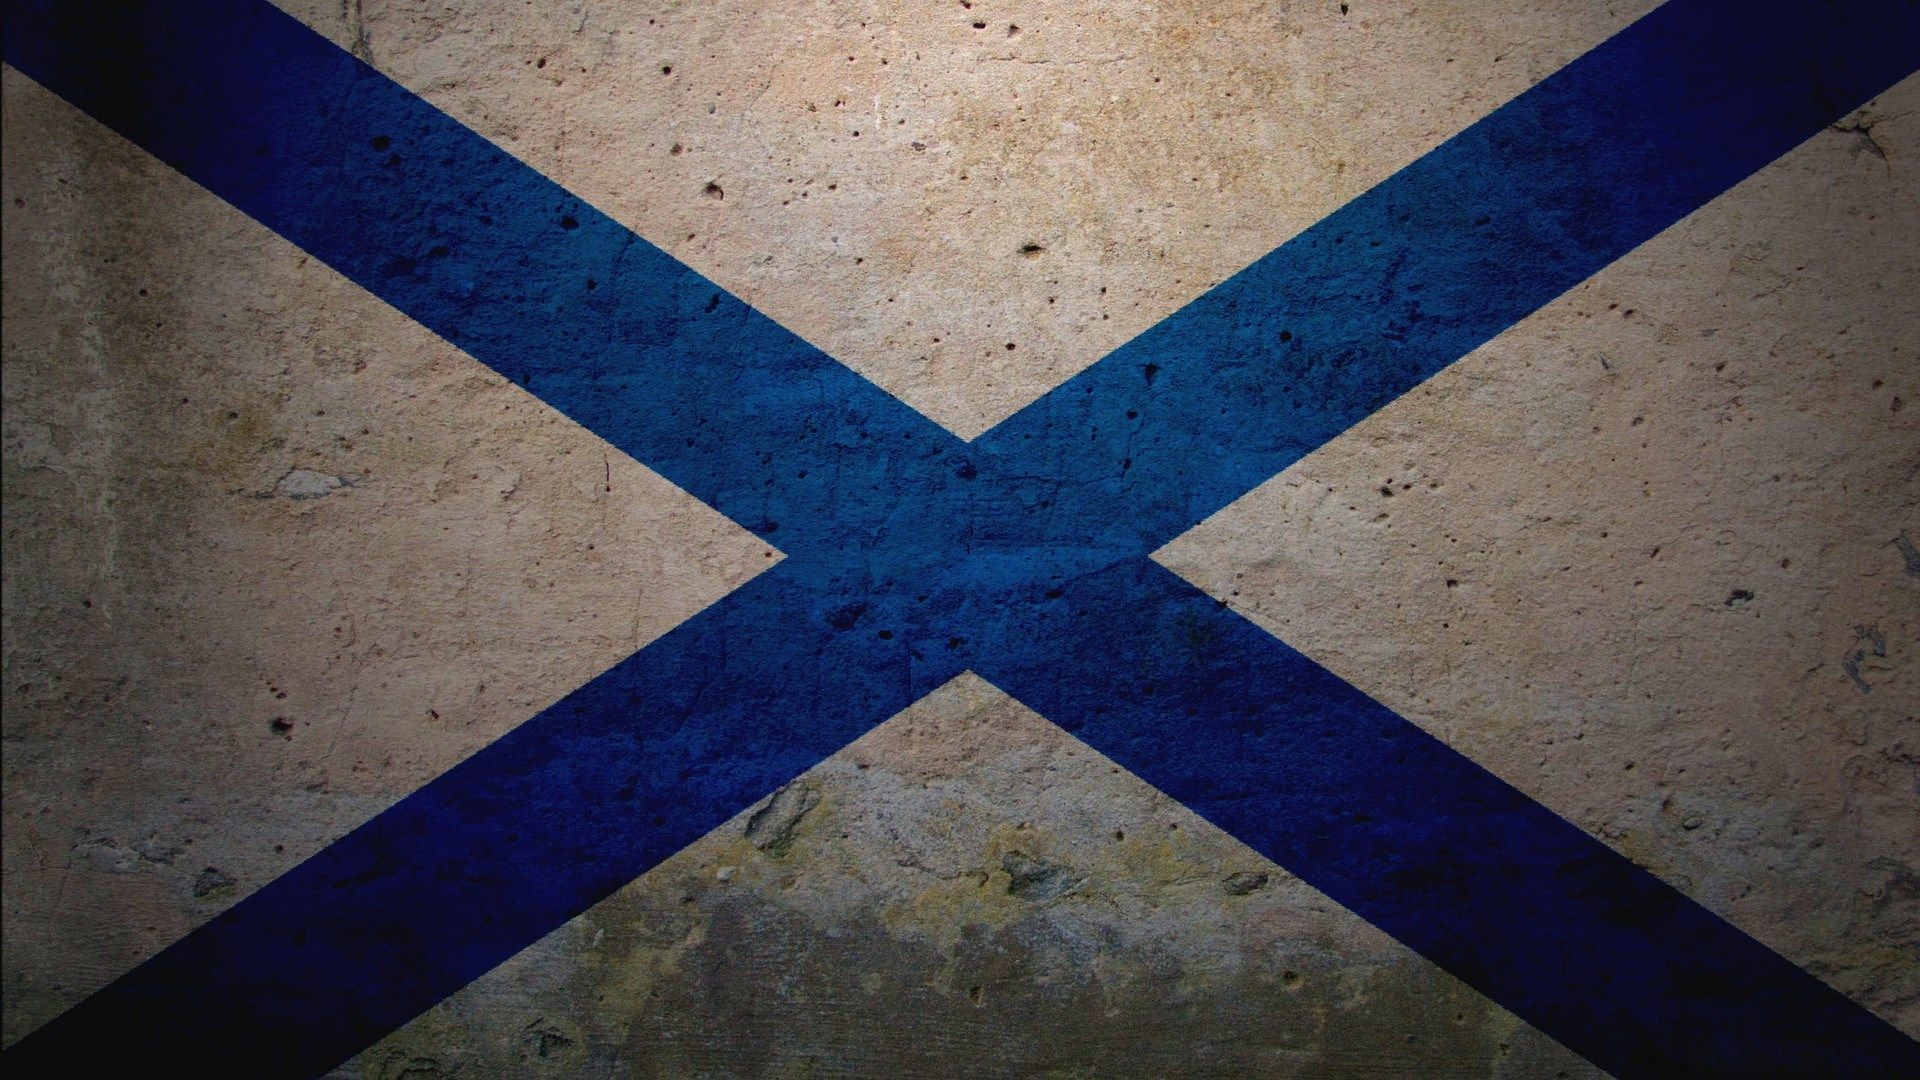 wallpaper images flag of scotland penn brook 1920x1080